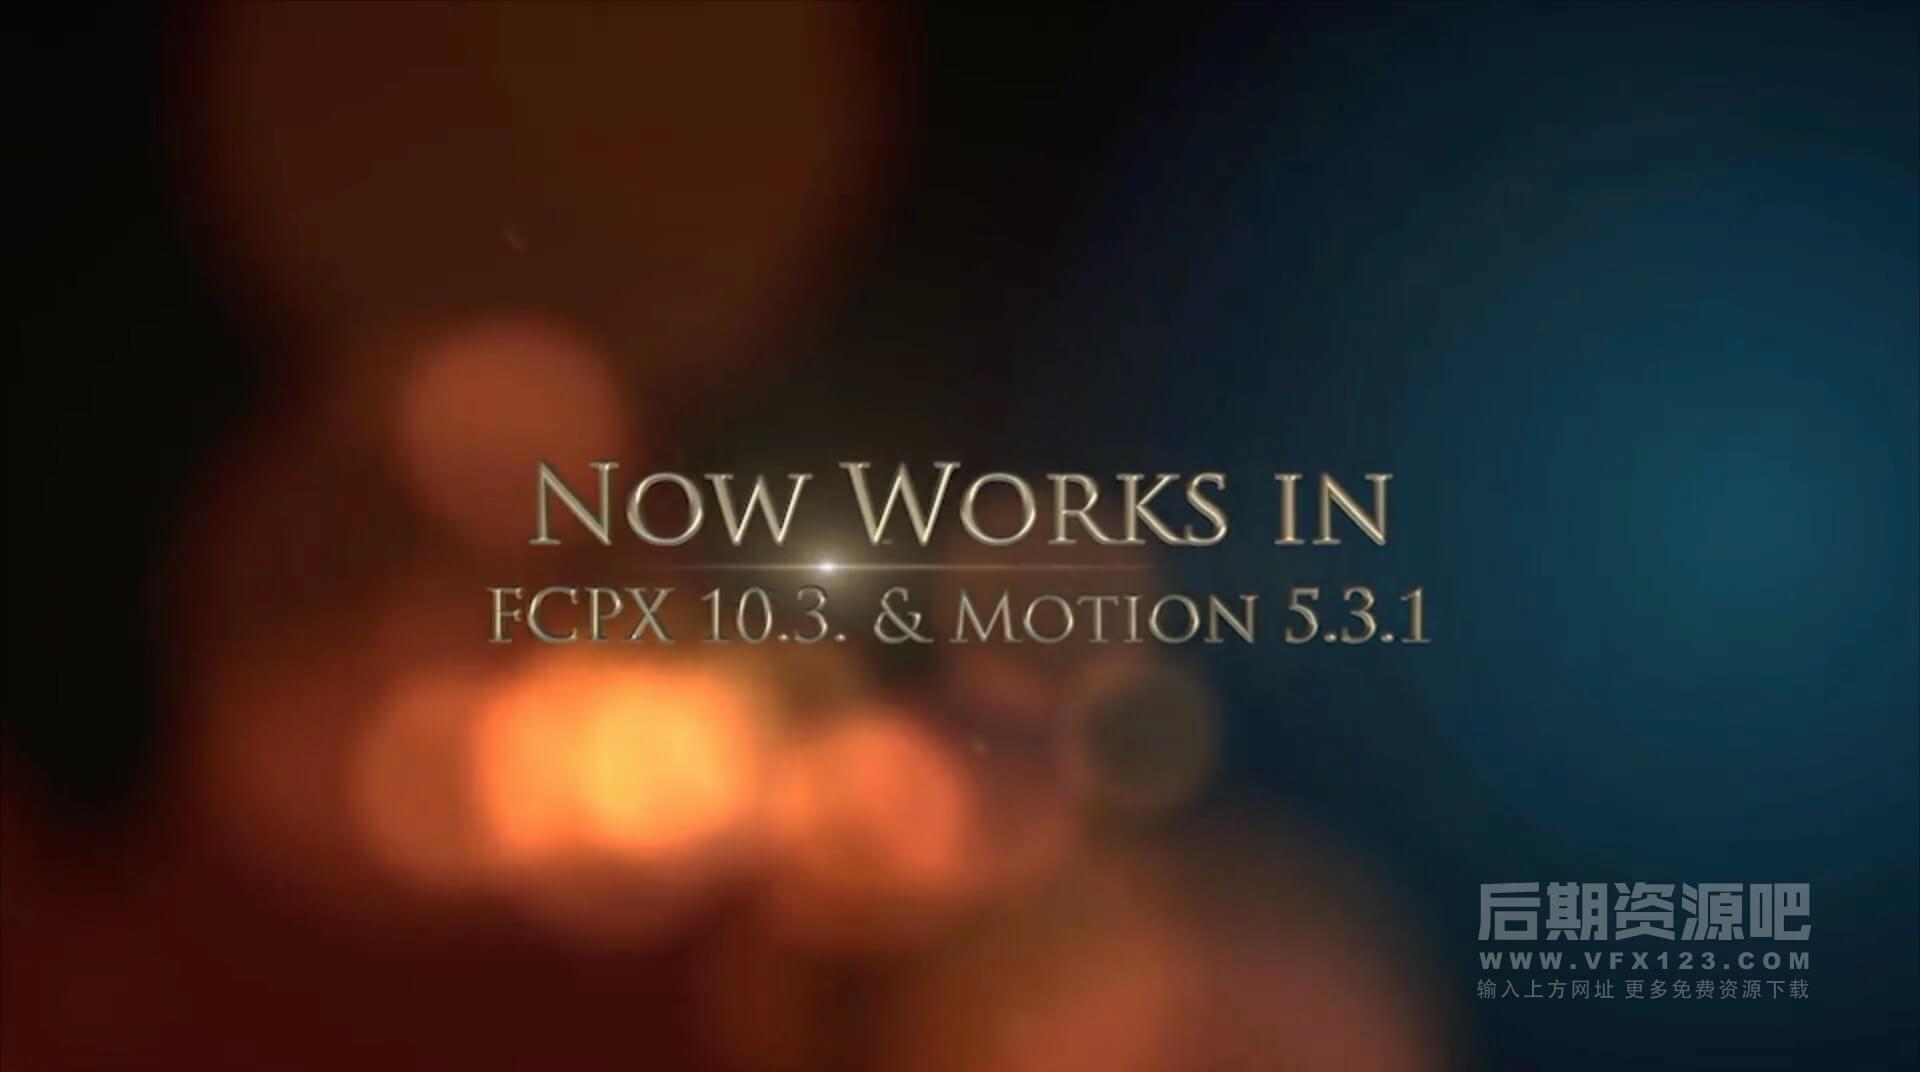 Fcpx插件 震撼大气颁奖典礼电影预告片金色粒子3D字幕片头模板 Cinematic Trailer Titles